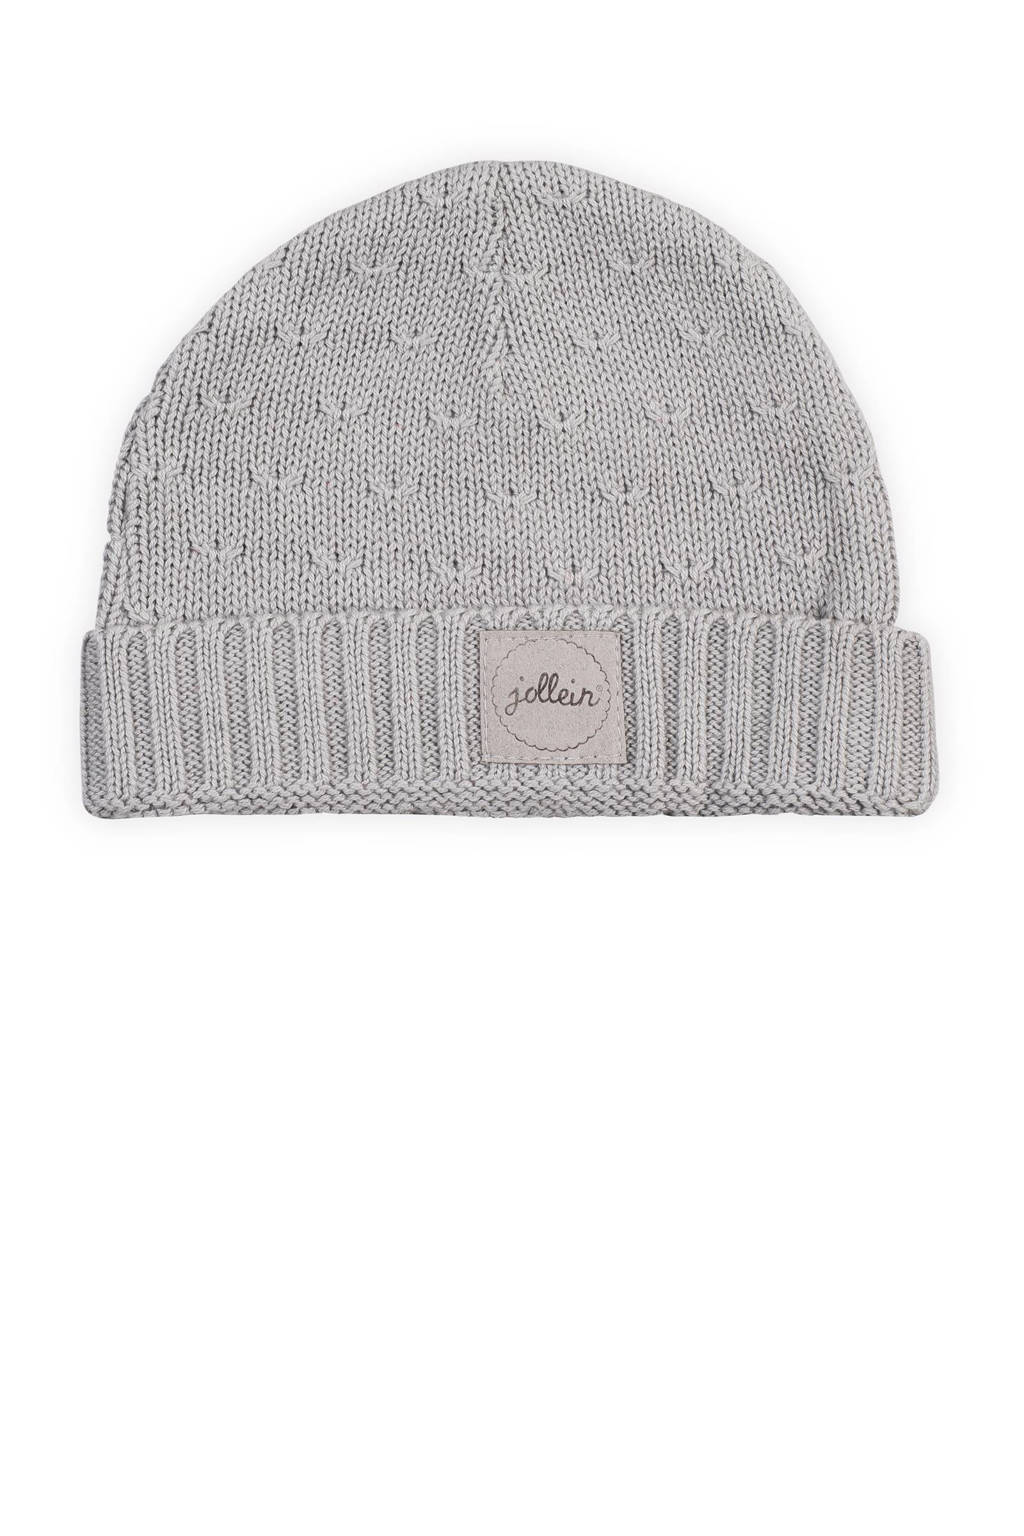 Jollein soft knit mutsje 2-9 mnd light grey, Light Grey